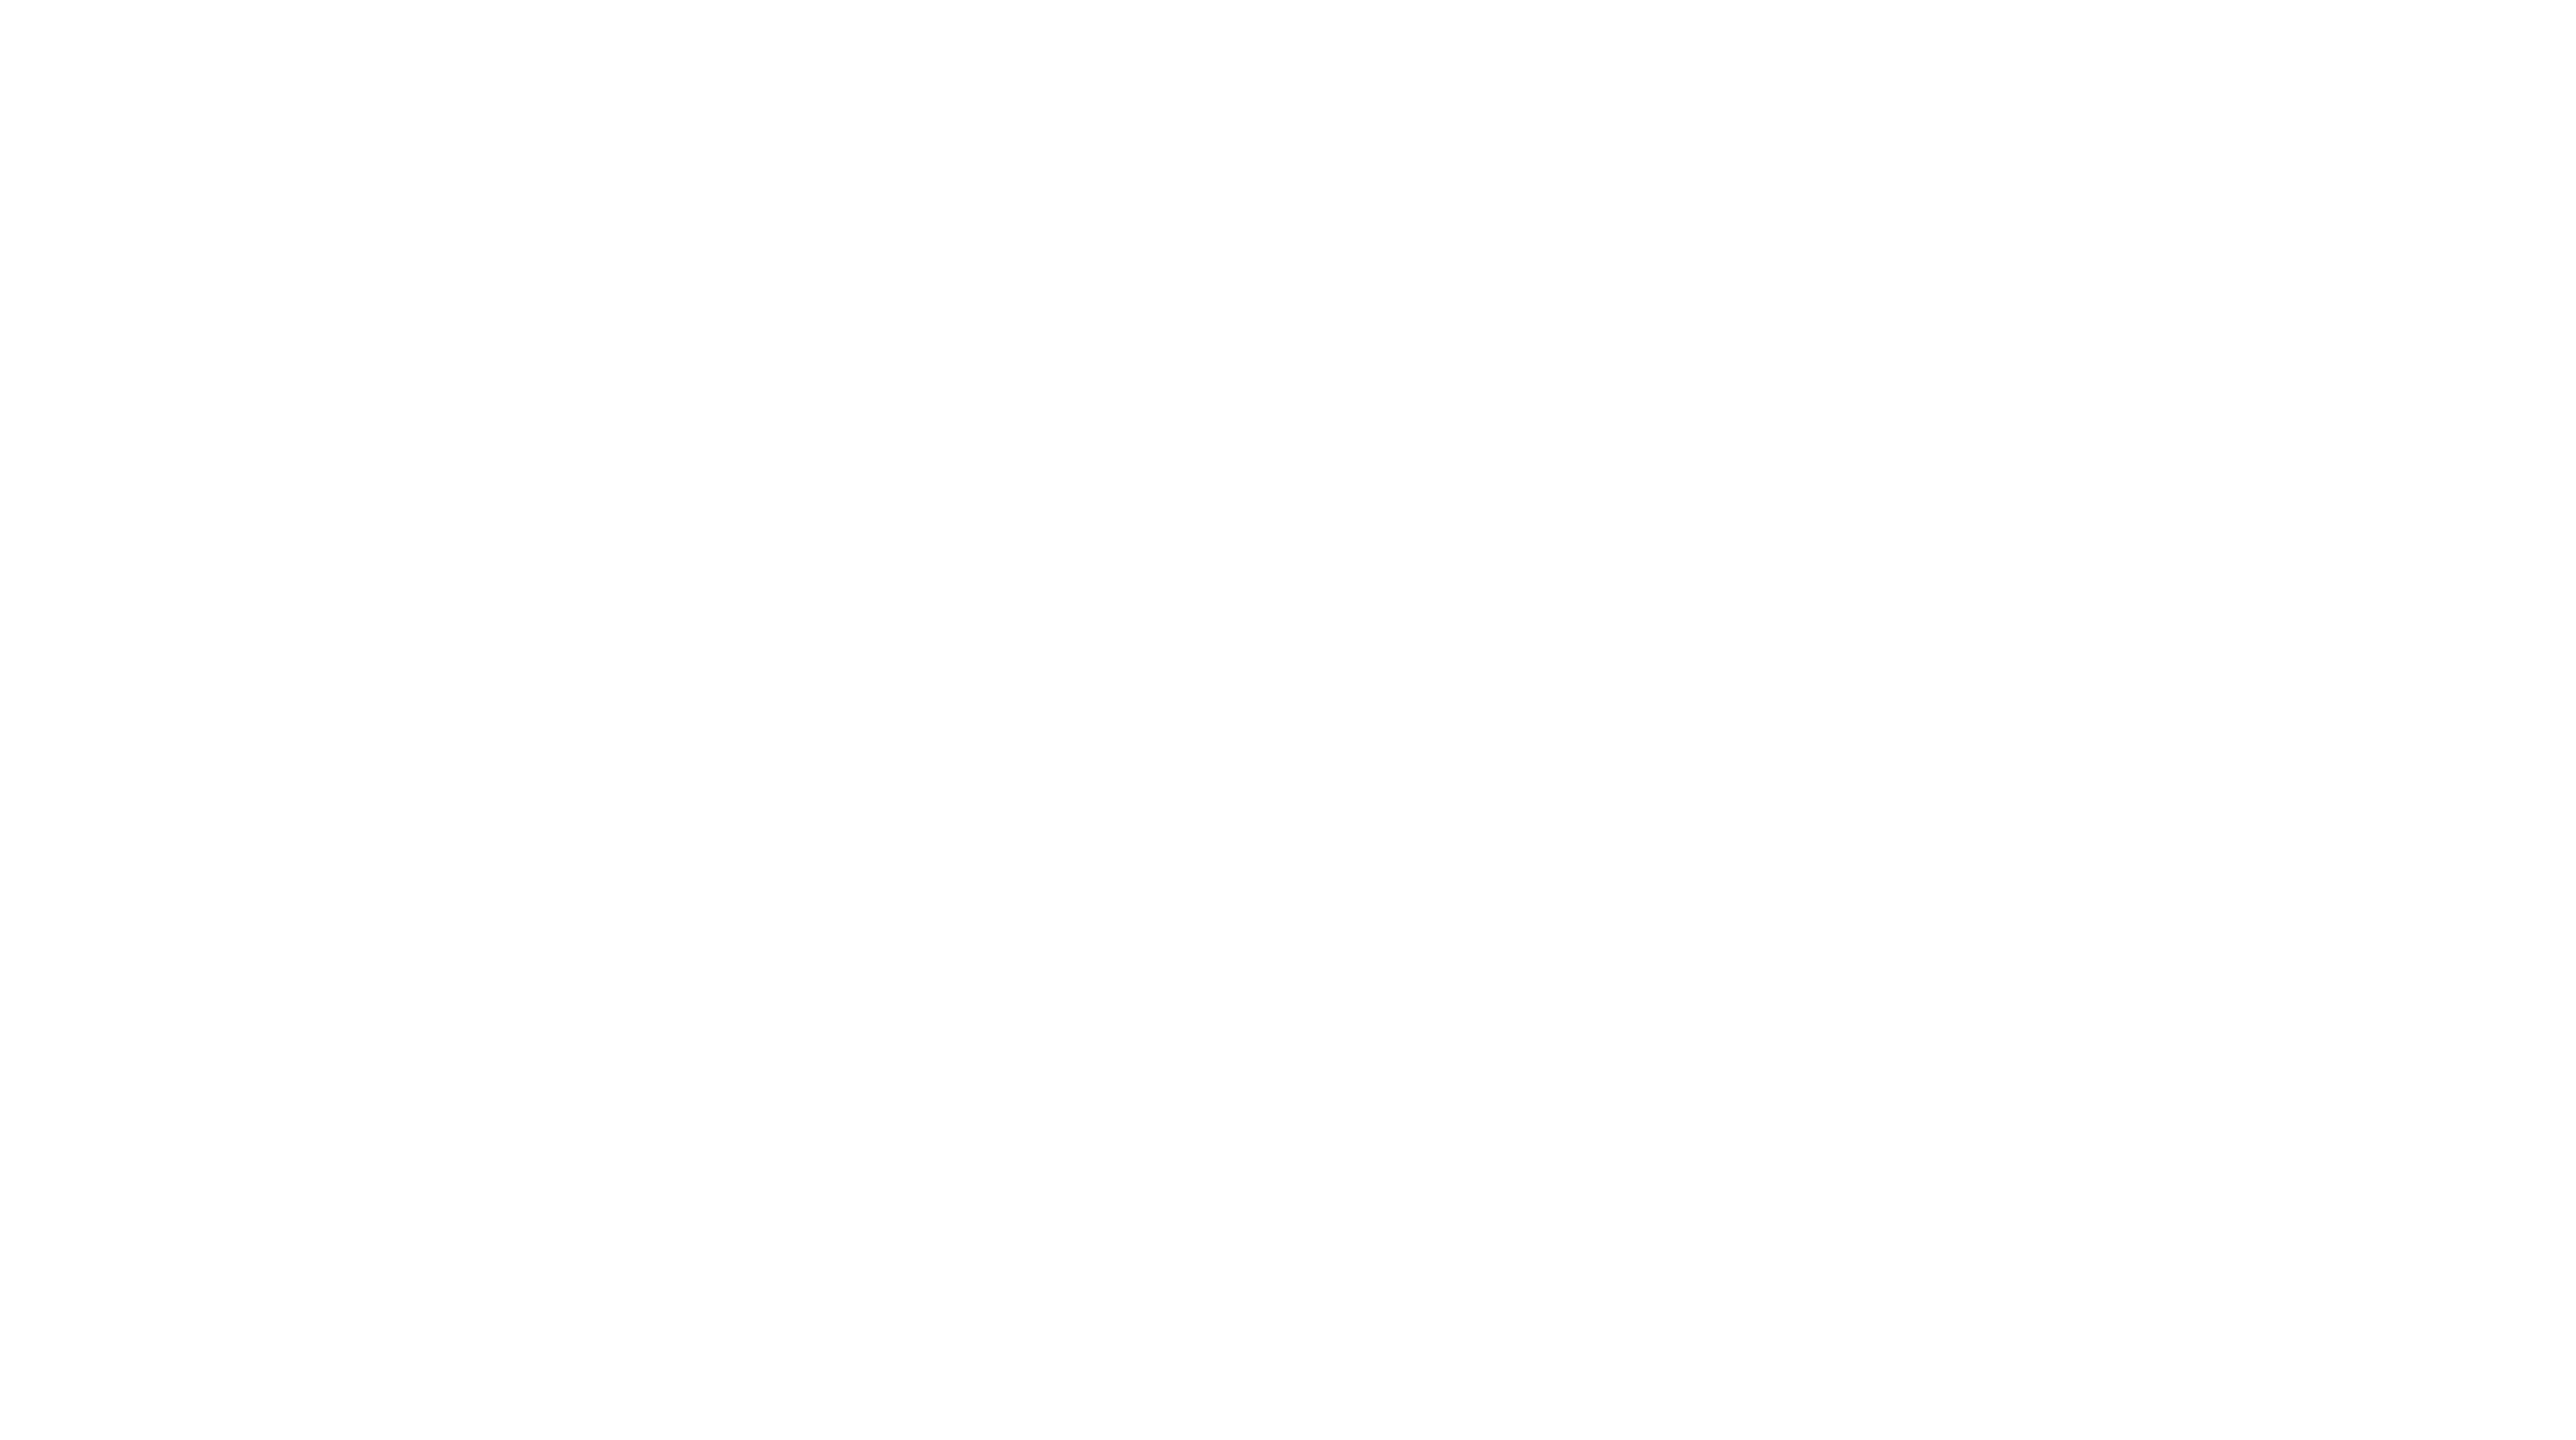 Captive Photo